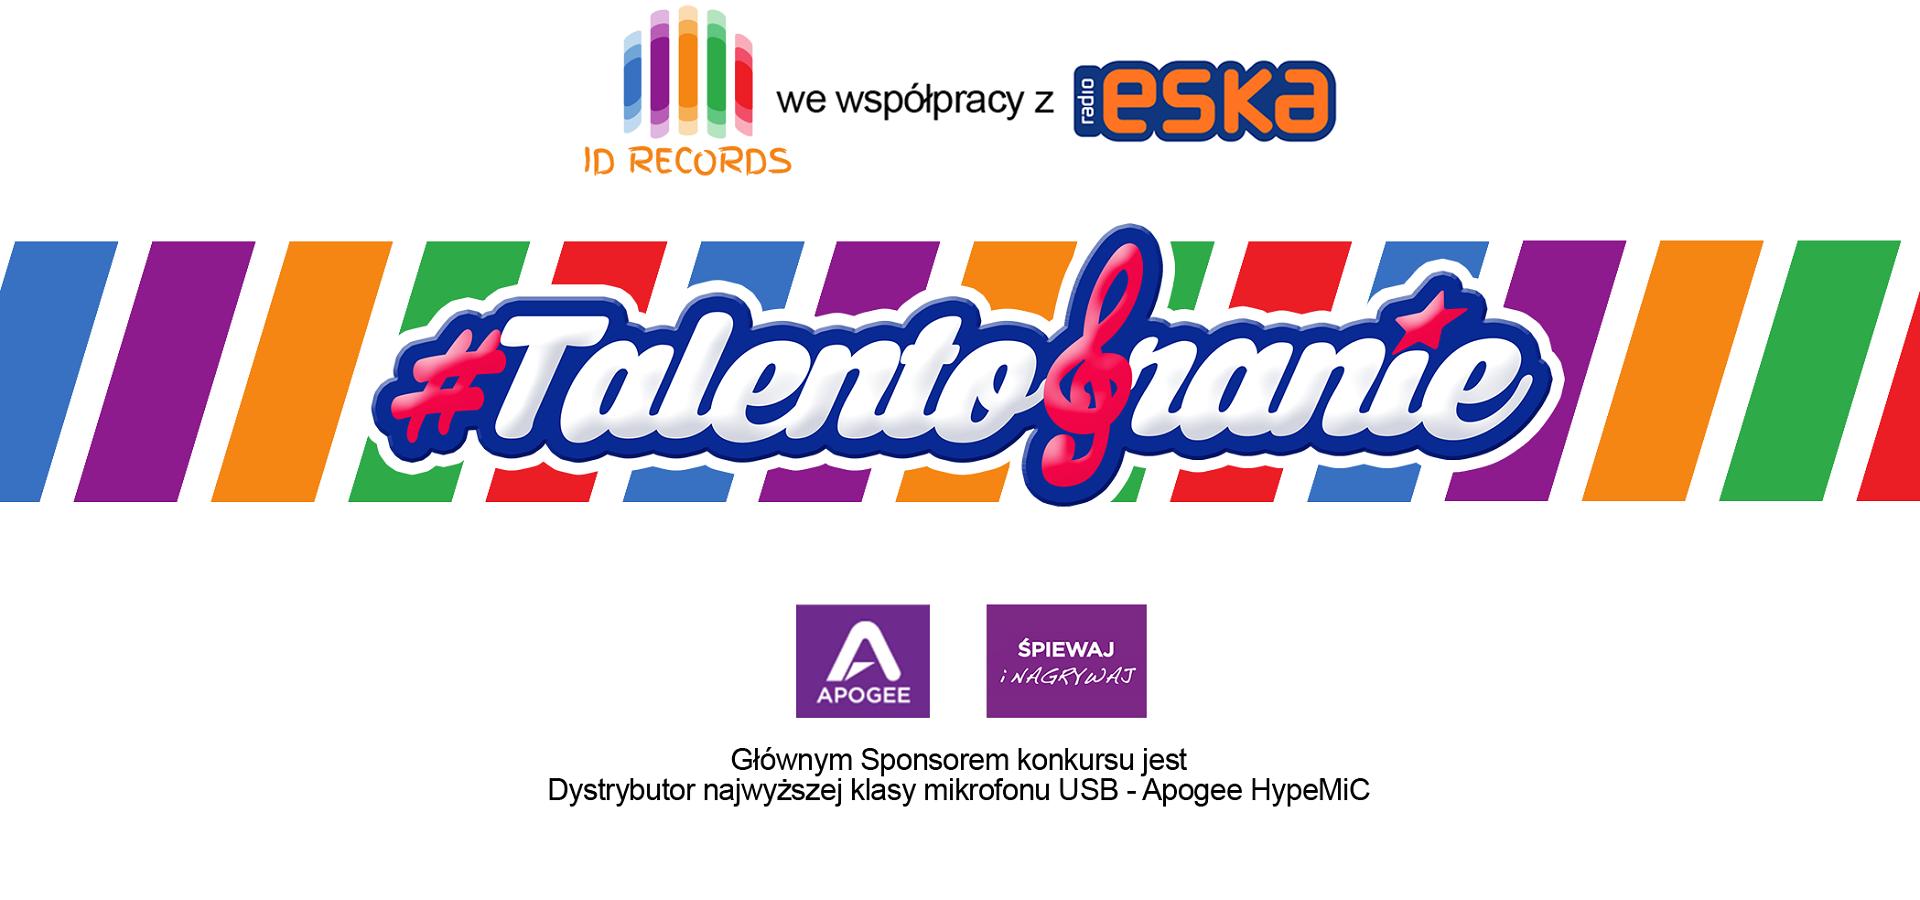 Talentobranie